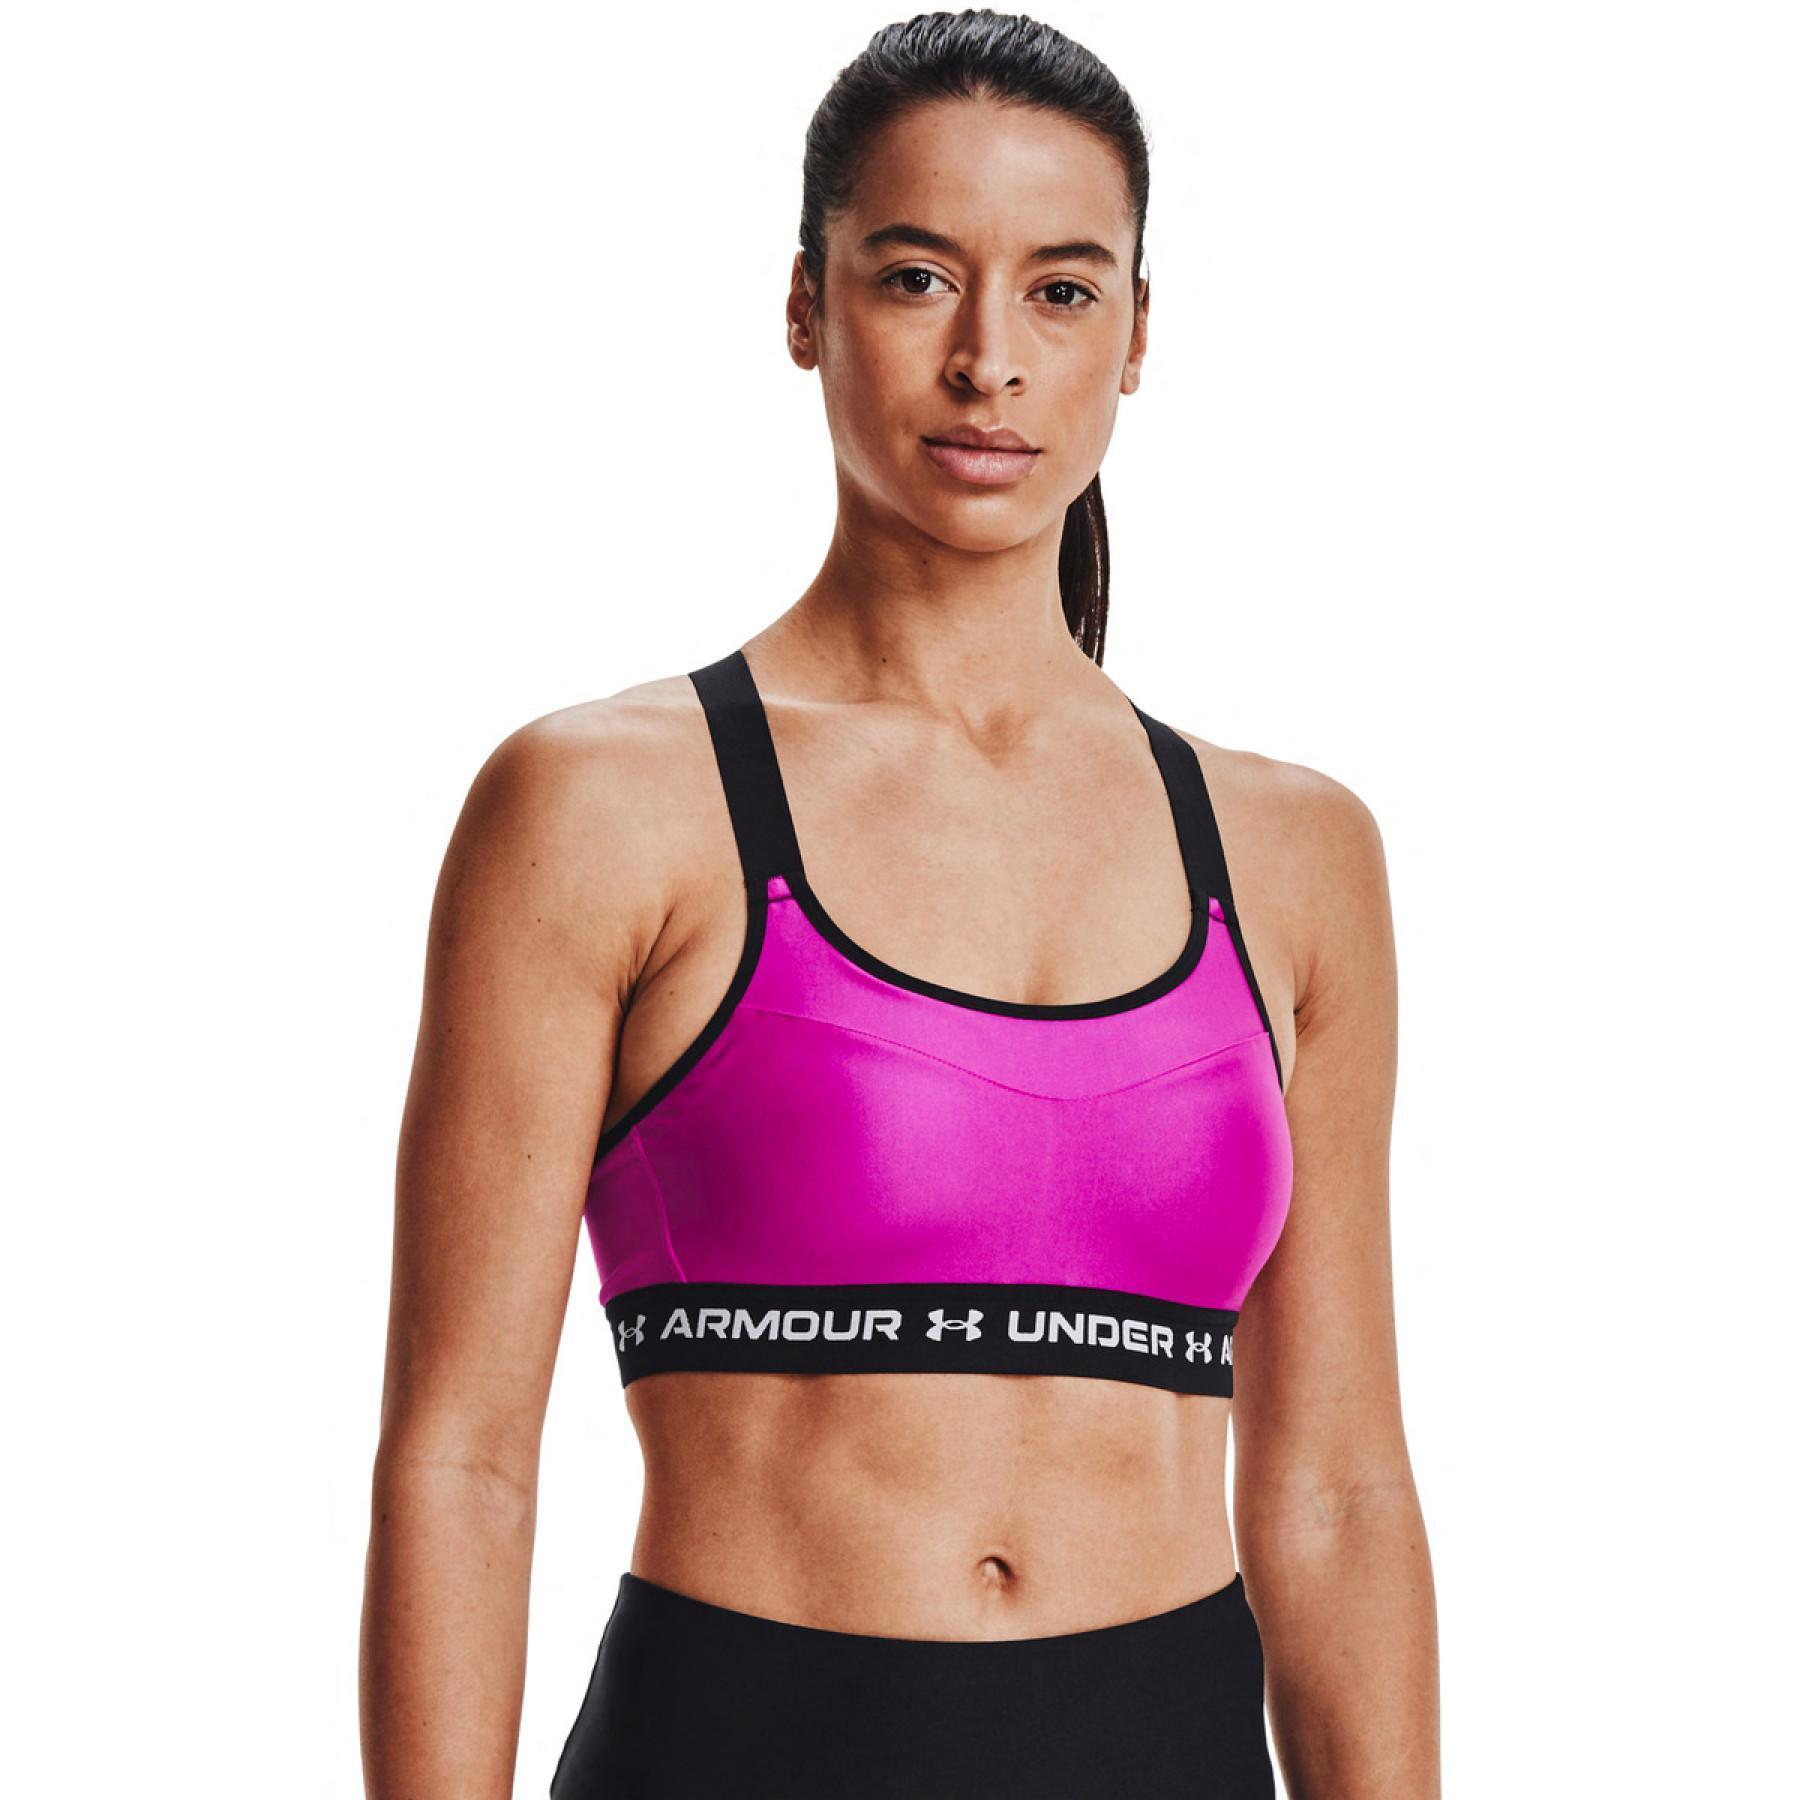 Under Armour Women's High Crossback Sports Bra